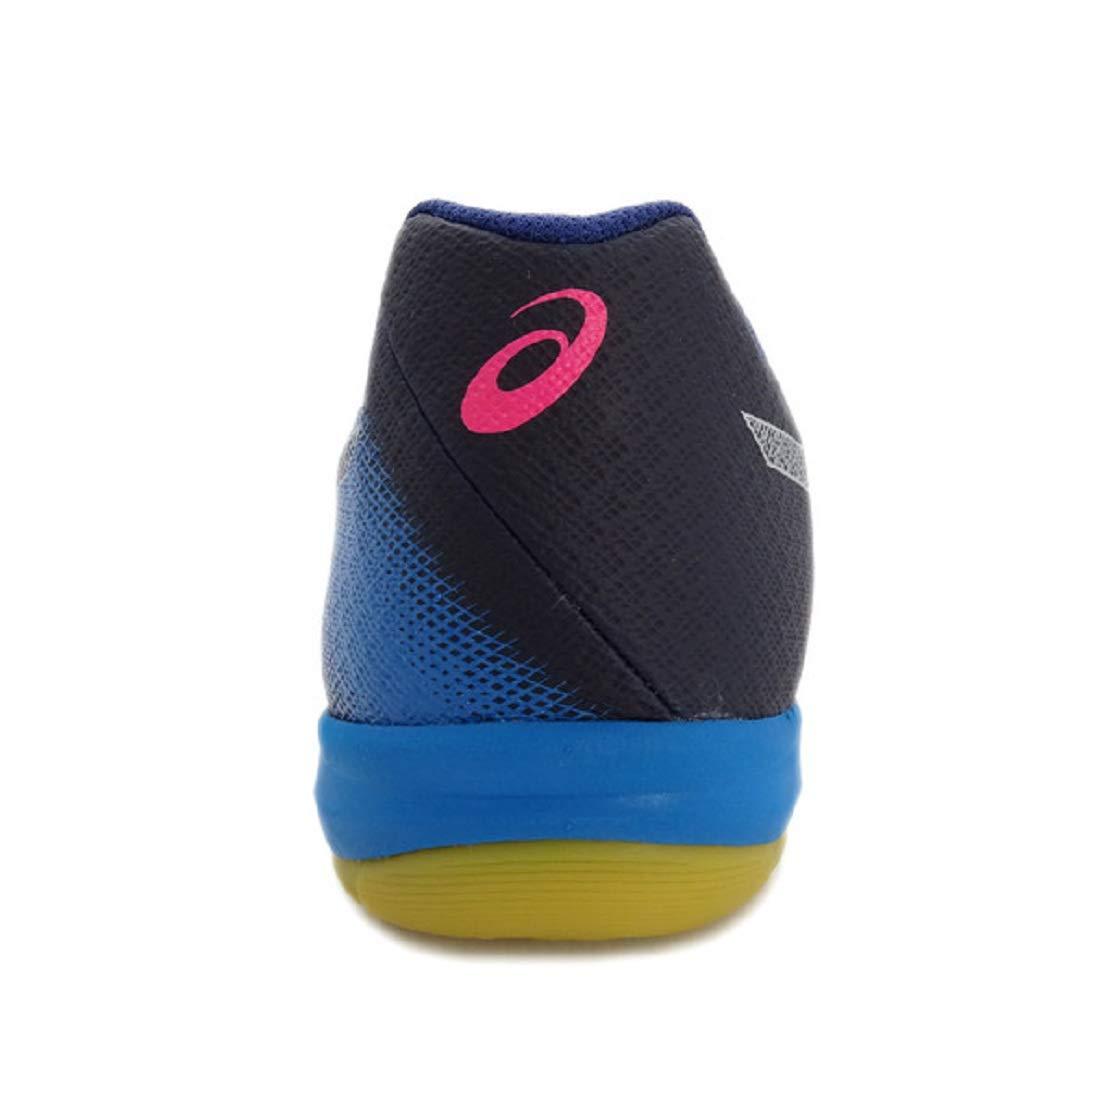 Shoes 6 In Prices Badminton Men's Online Low Asics Gel Buy Blade At twS6XPq